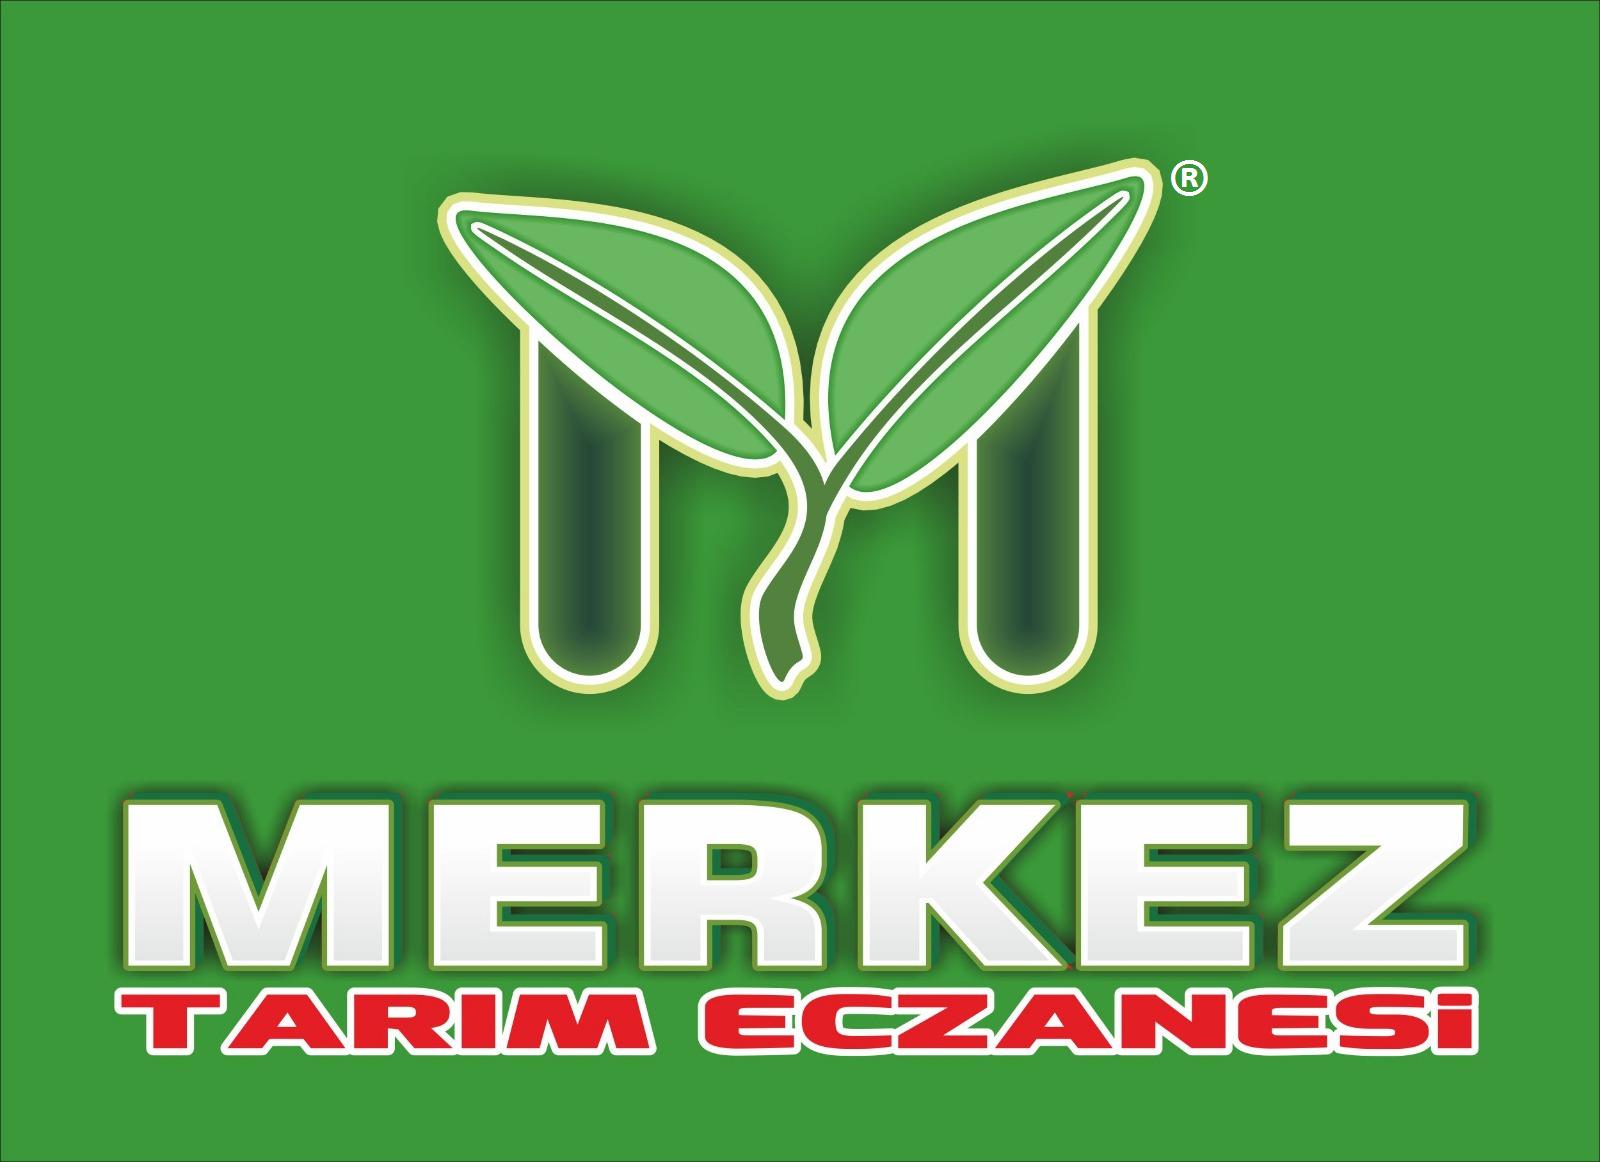 «merkeztarimeczanesi®